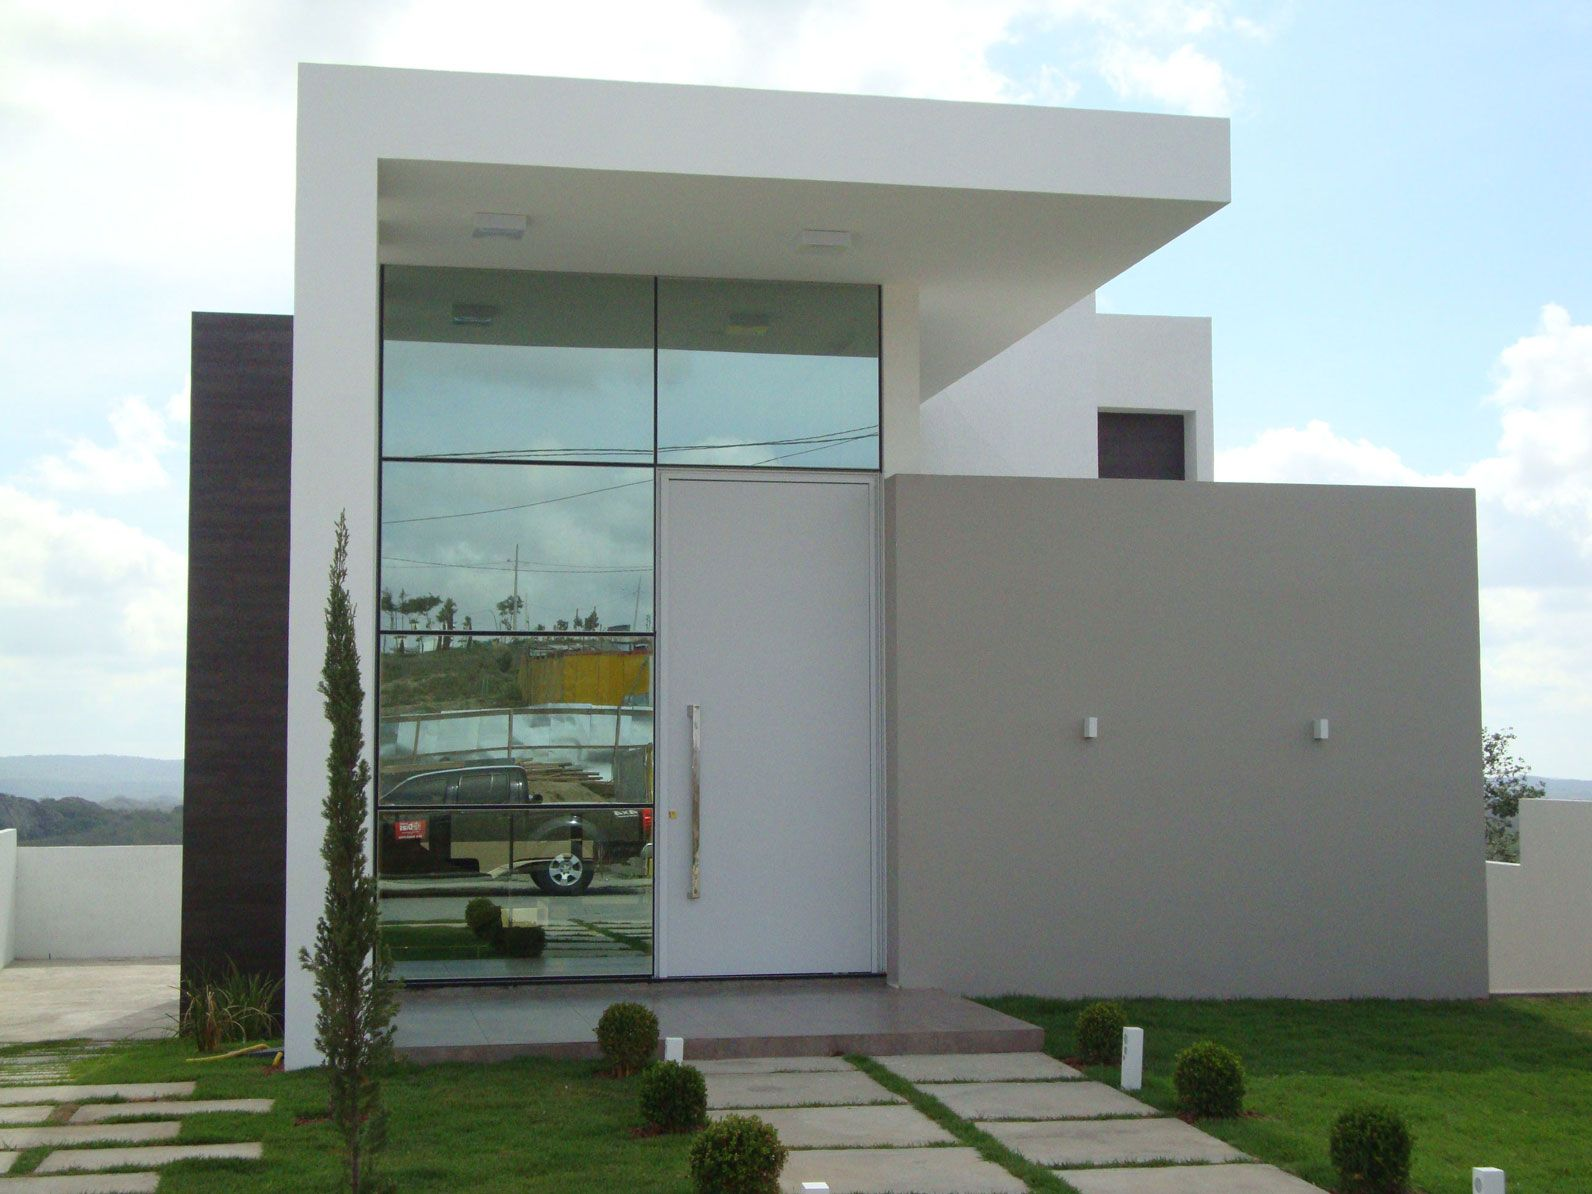 fachada-residencial-pele-de-vidro-structural-glazing | sweet home ...